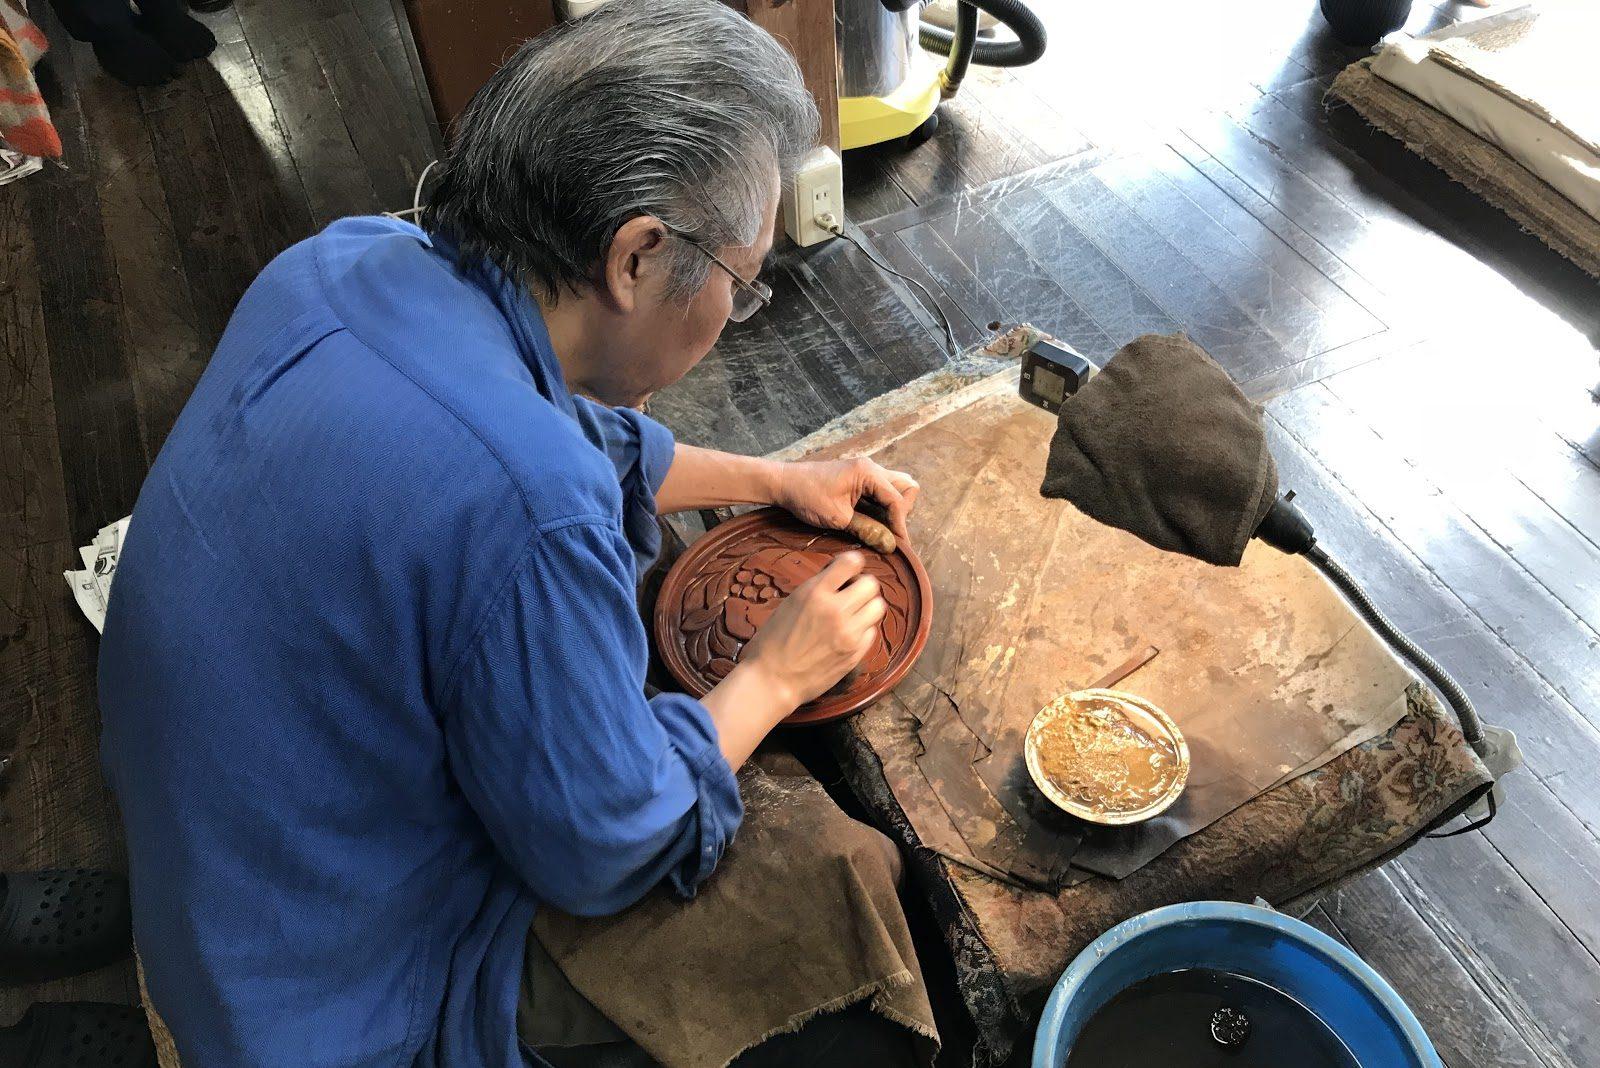 Beyond touristy Kamakura: Explore the local Kamakurabori culture